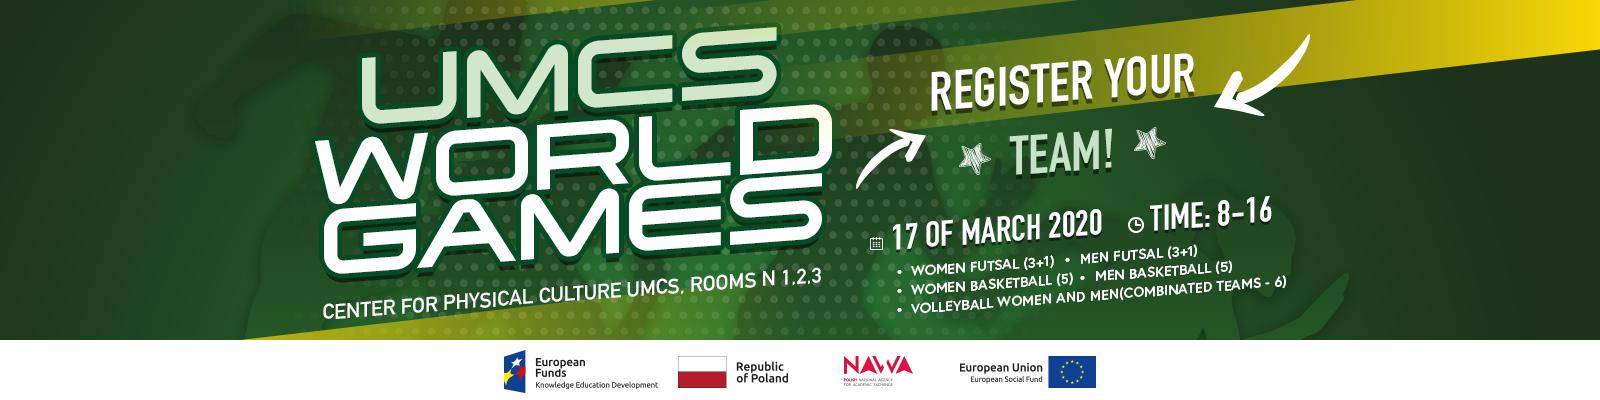 World Games UMCS